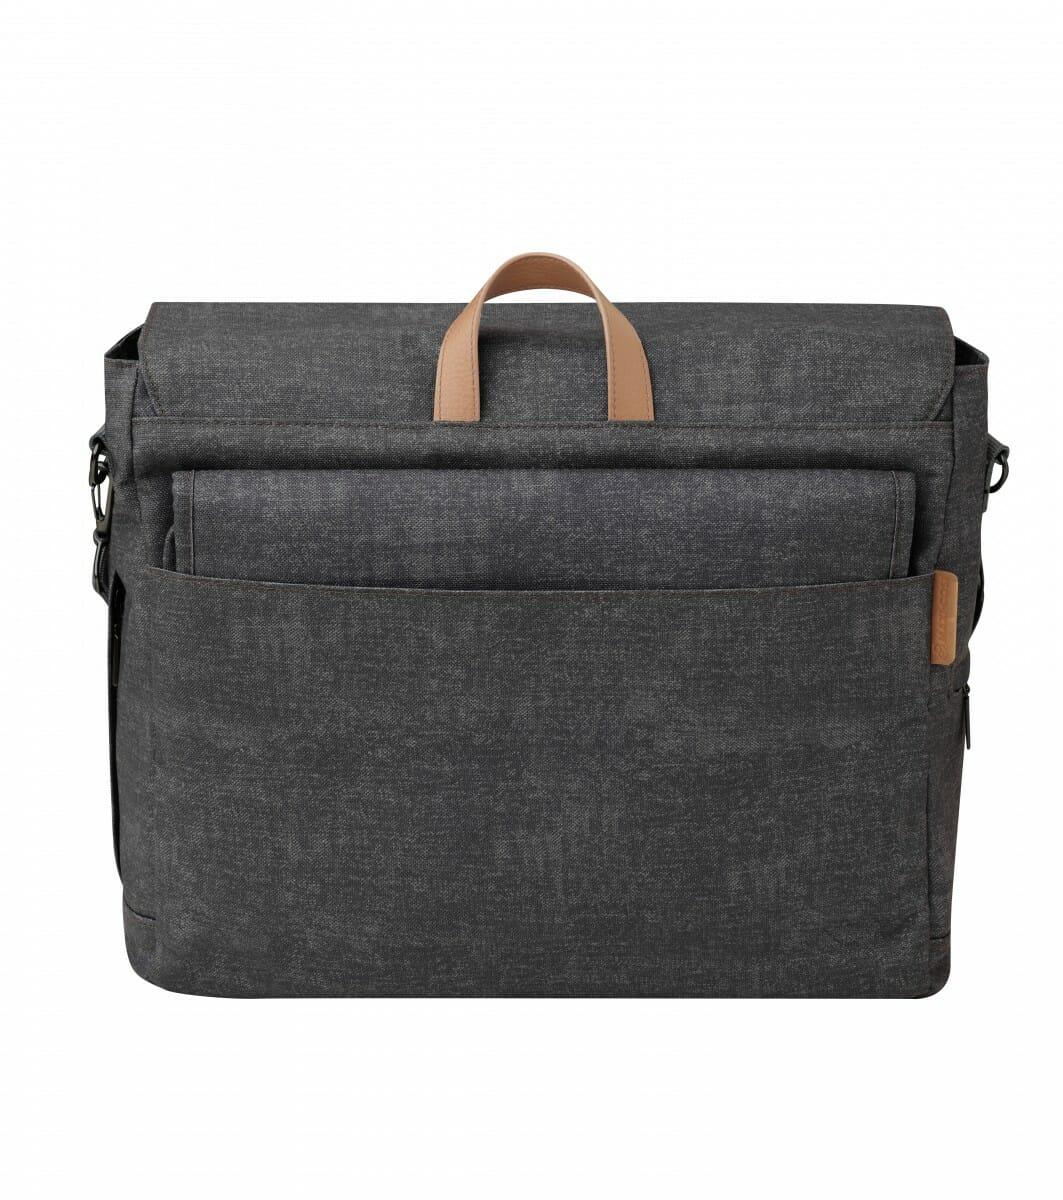 Maxi Cosi Modern Nappy Bag Nomad Black 02